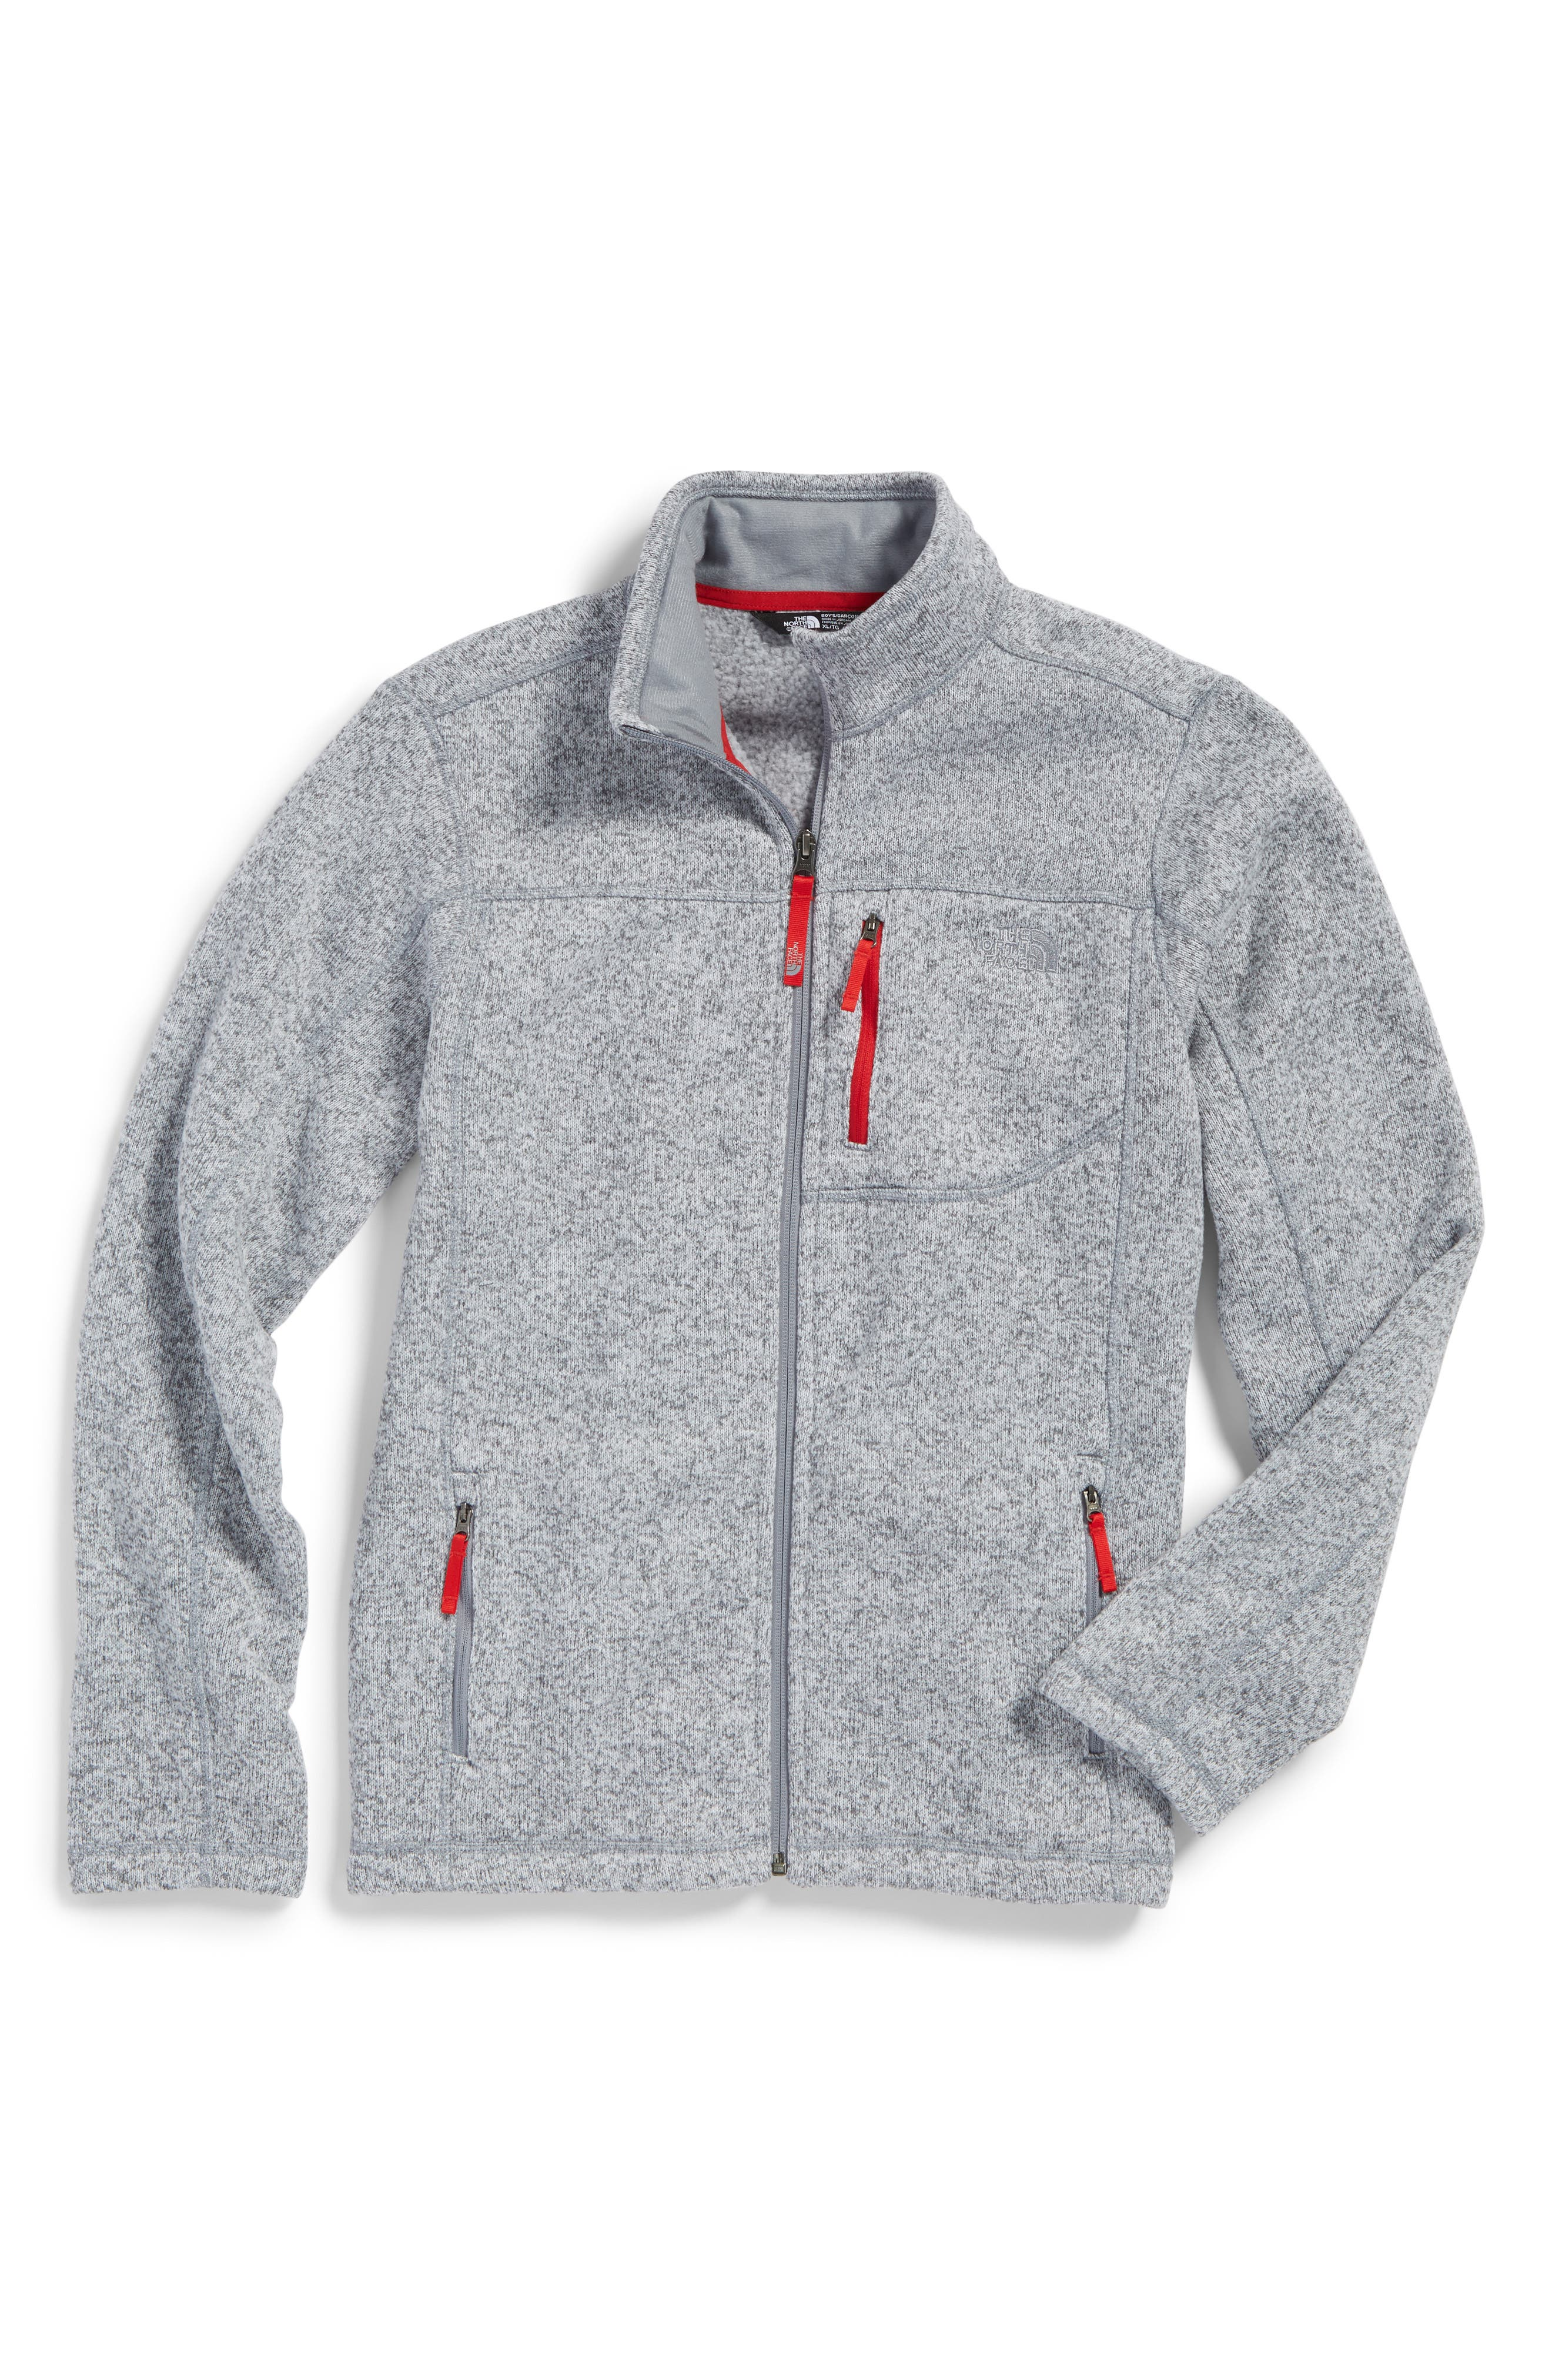 Gordon Lyons Sweater Fleece Zip Jacket,                             Main thumbnail 4, color,